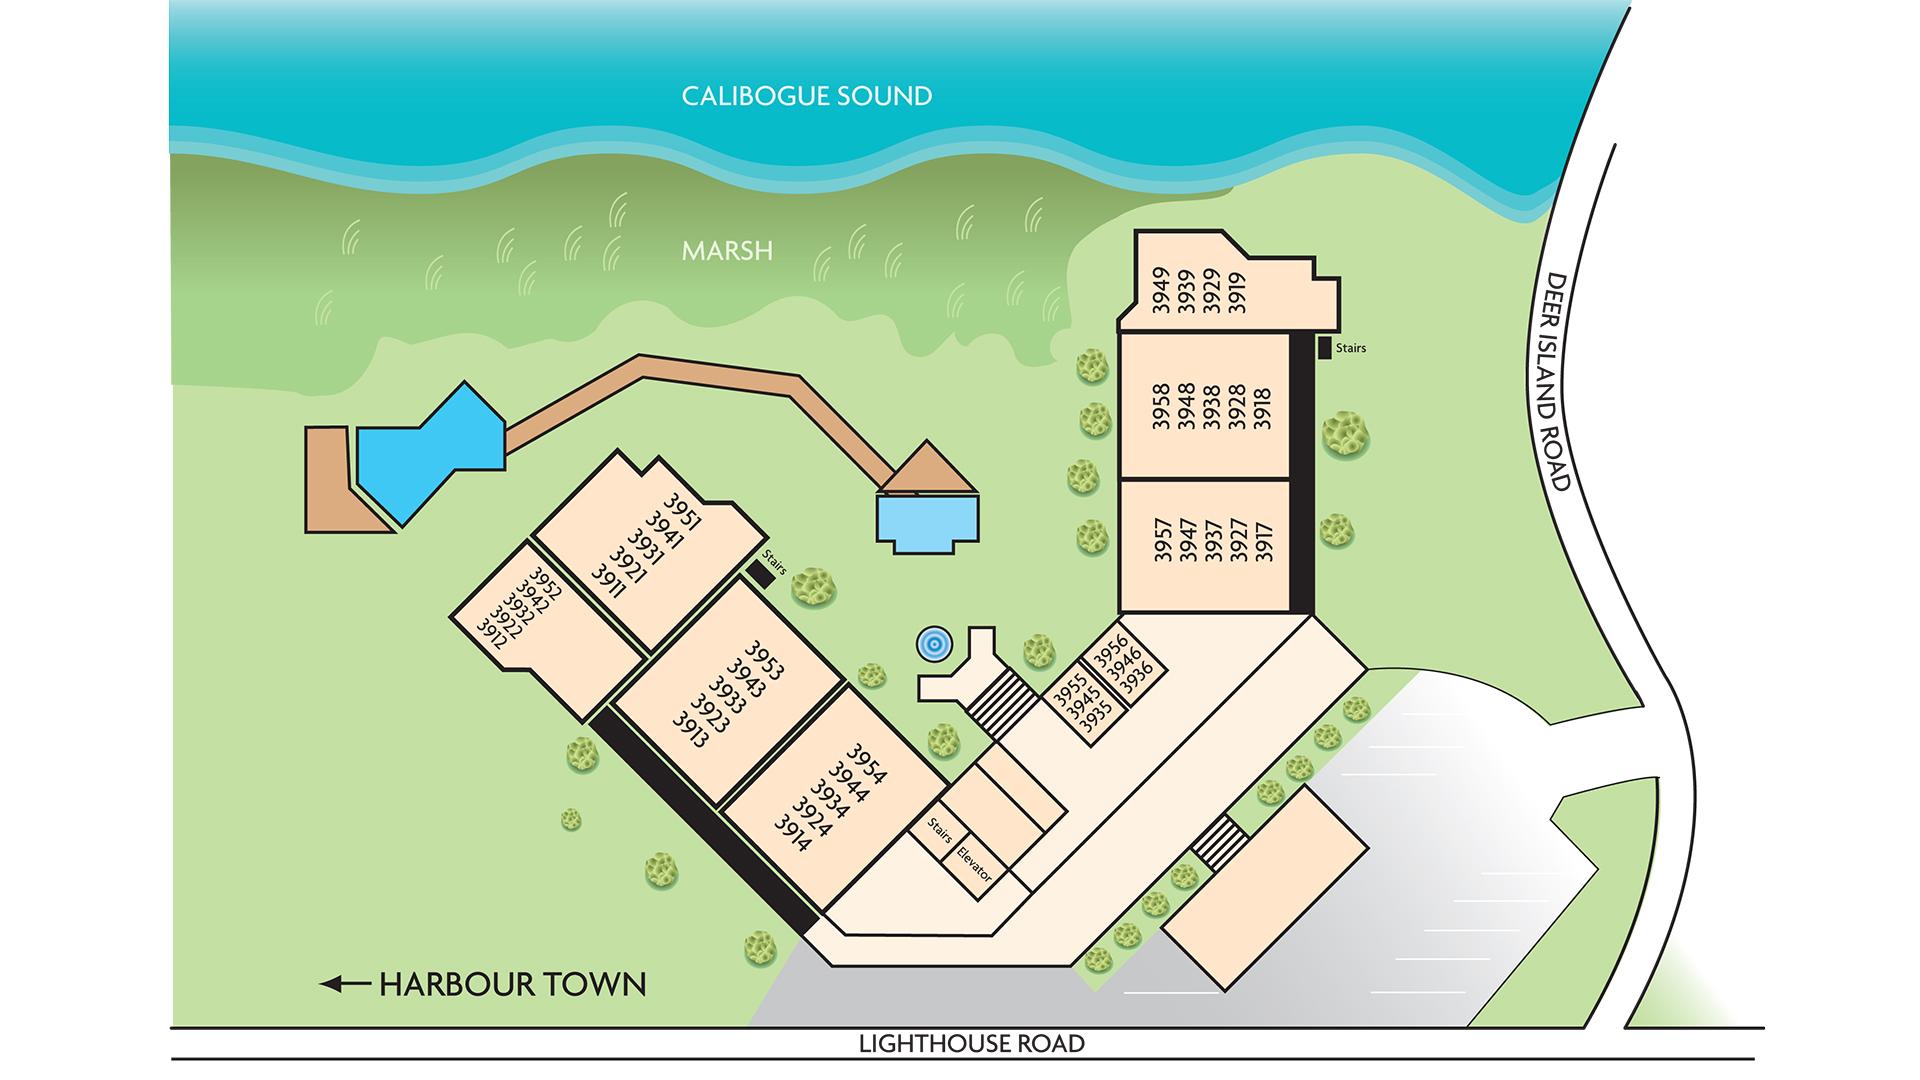 Map | Marriott's Harbour Club Sea Pines Resort Map on harvard university map, wyndham ocean ridge map, harbour town golf links map, cape cod rail trail map, atlanta map, palmetto dunes map, marriott's surfwatch map, beaufort map, port royal map, hilton head neighborhood map, florida map,